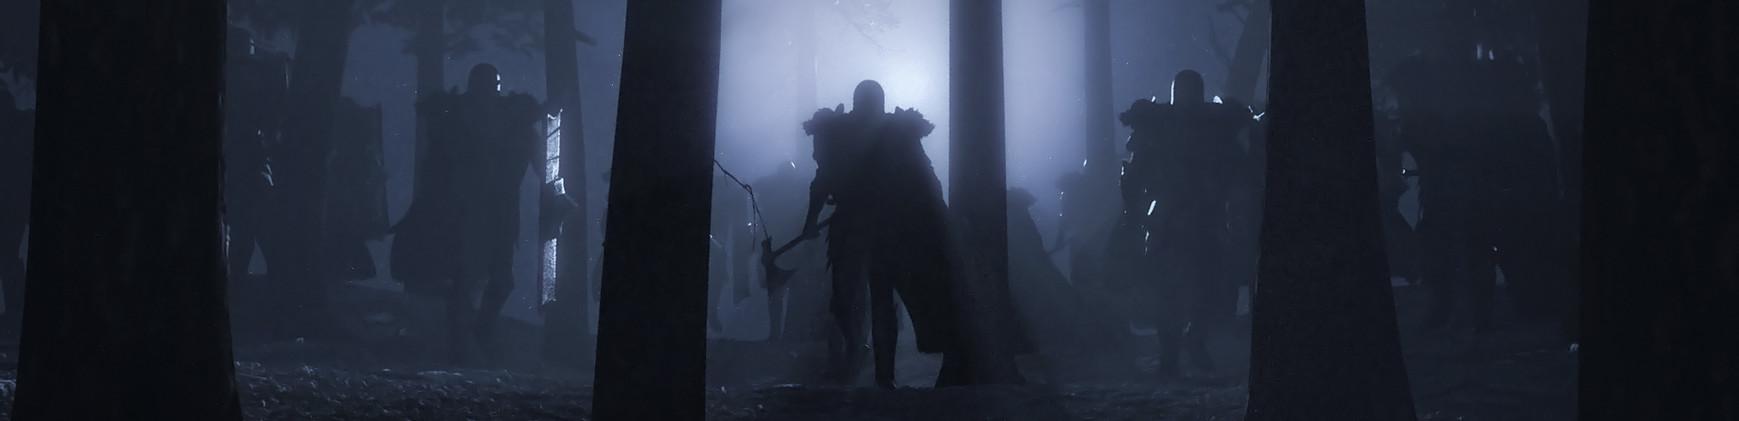 the shadows stride